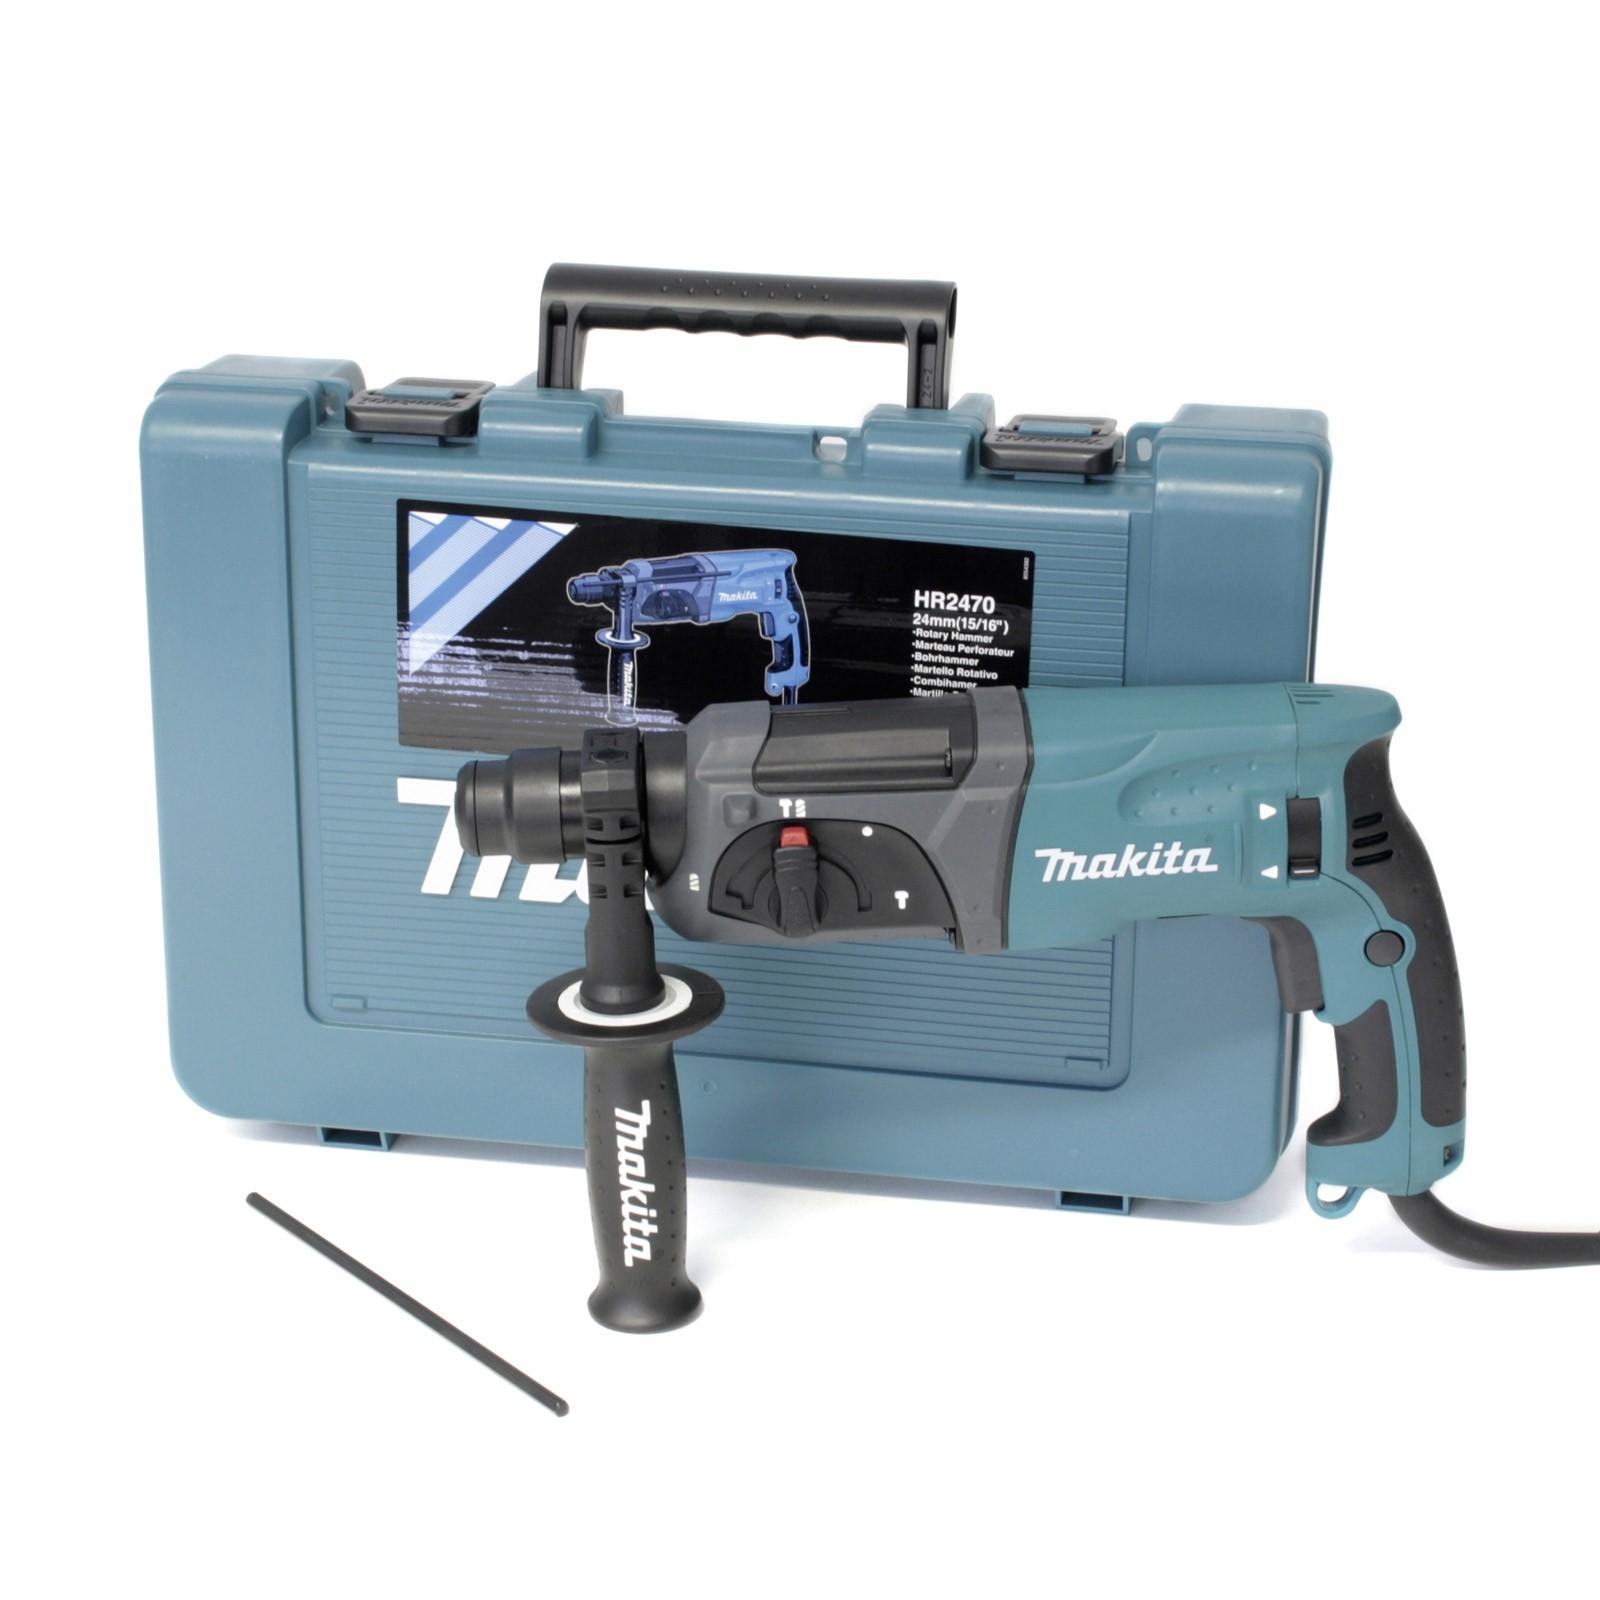 Makita Bohrhammer Abbruchhammer HR2470 SDS Plus 24mm 16034